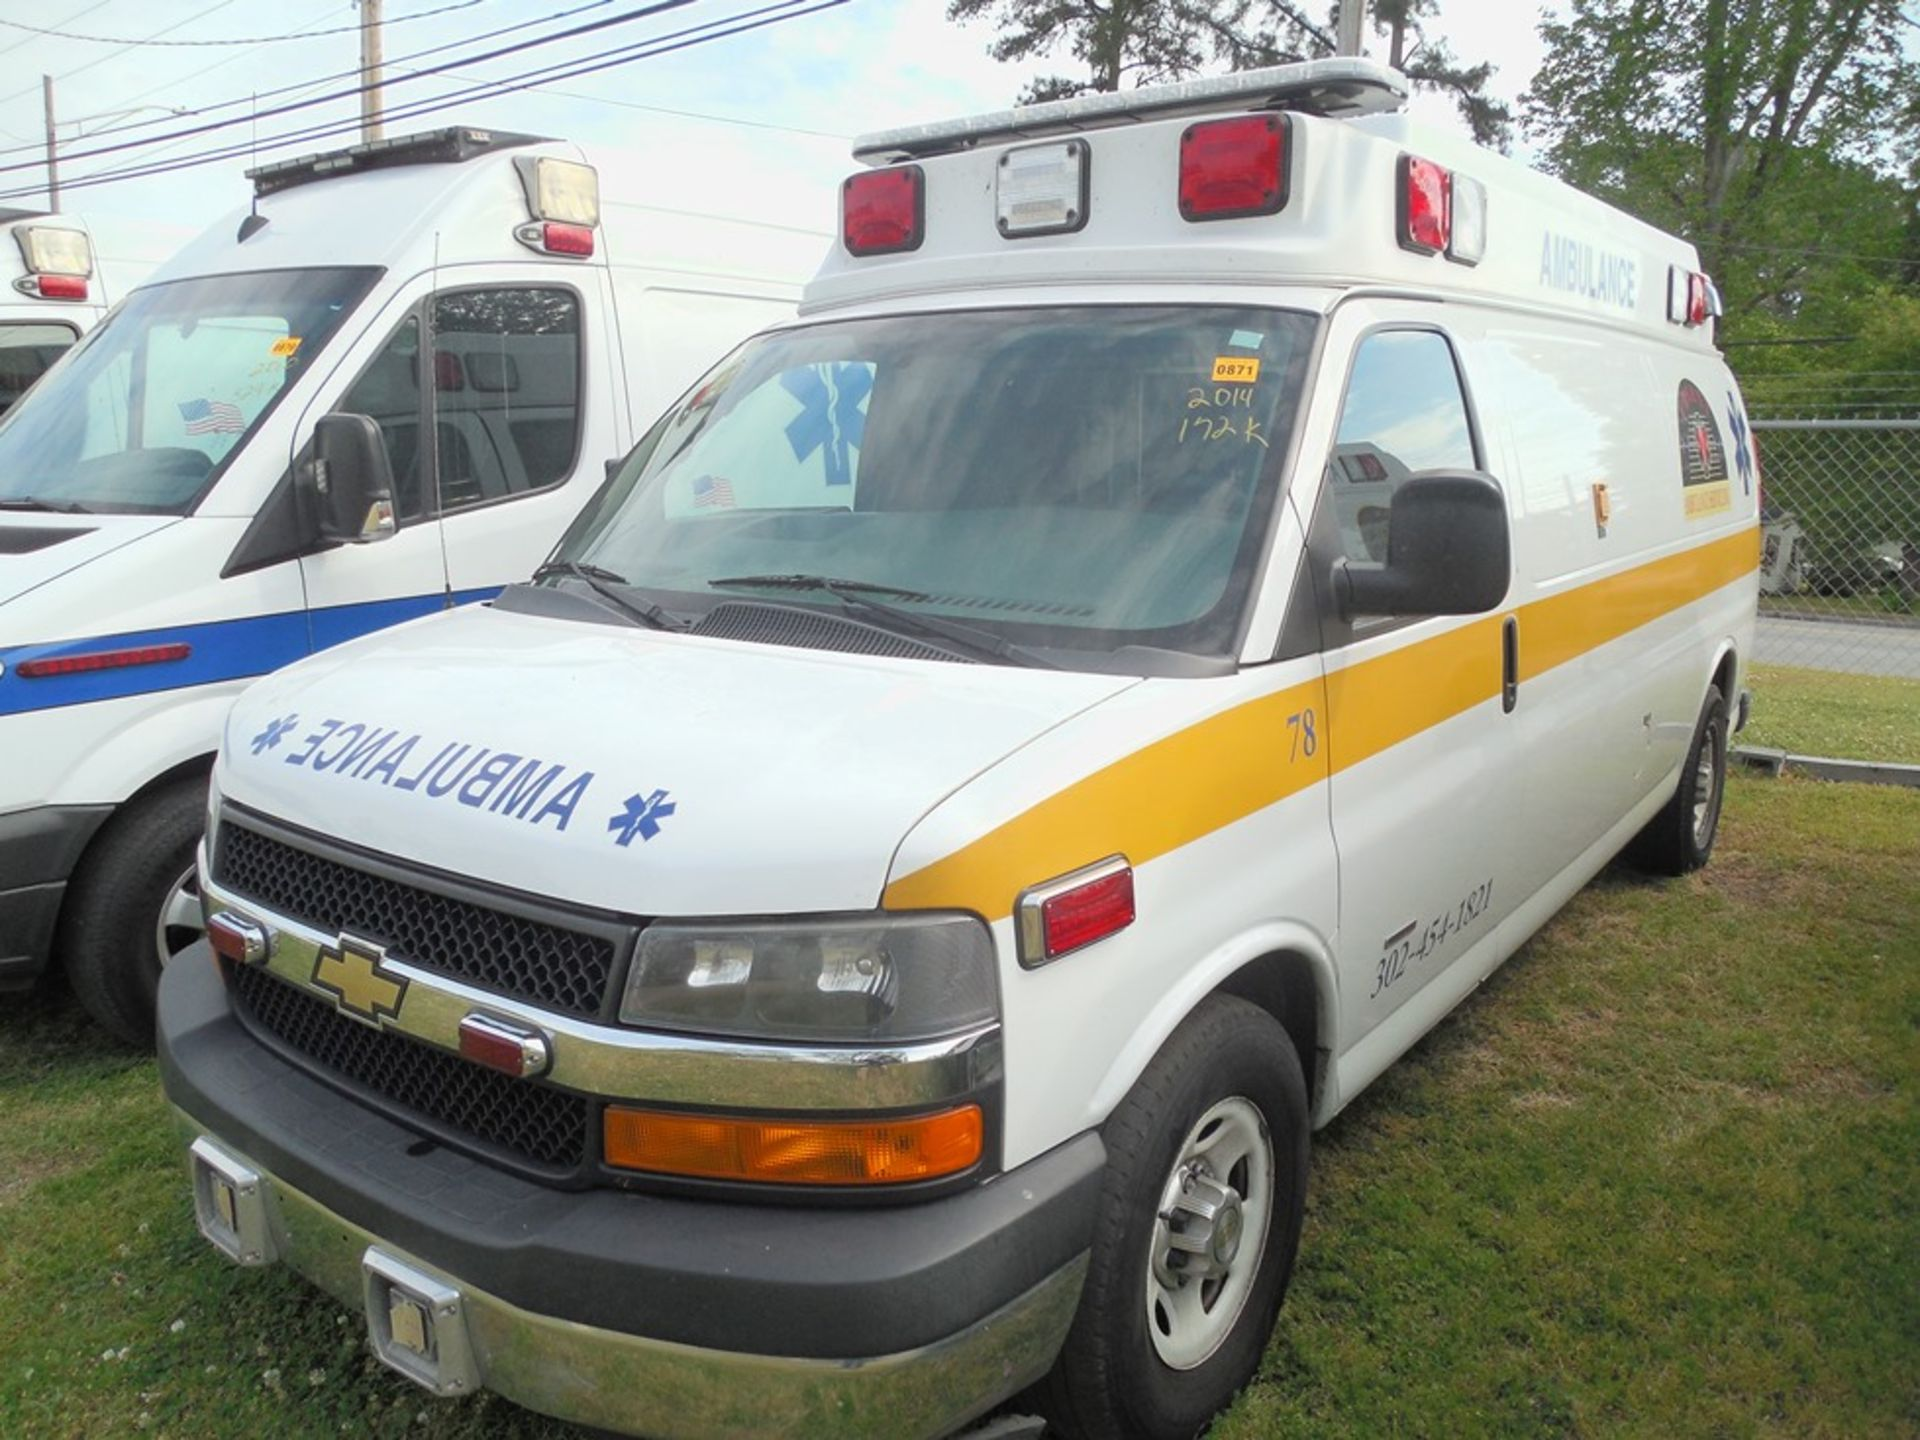 2014 Chev van ambulance dsl, 172,472 miles, vin# 1GBZGUC19E1162022 - Image 2 of 6